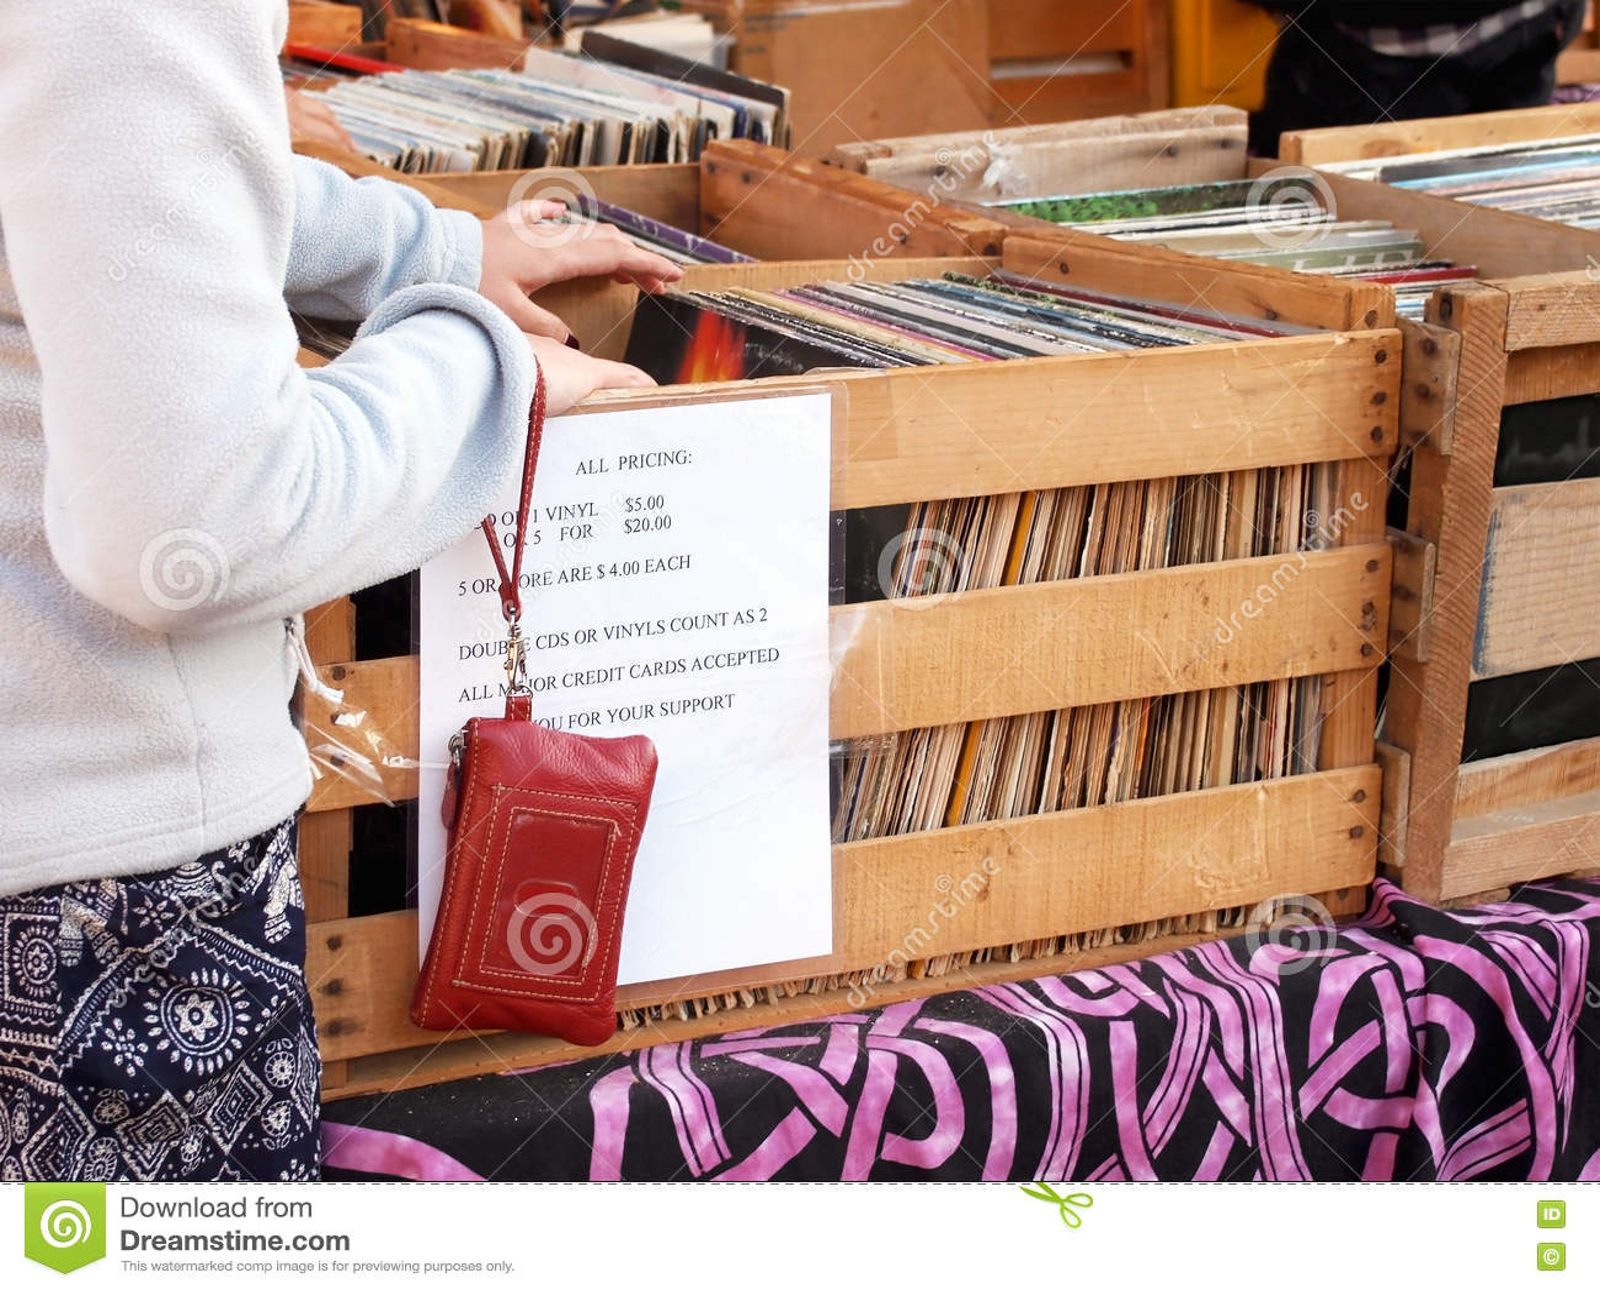 vintage vinyl record shopping stock photo image of shopping vinyl